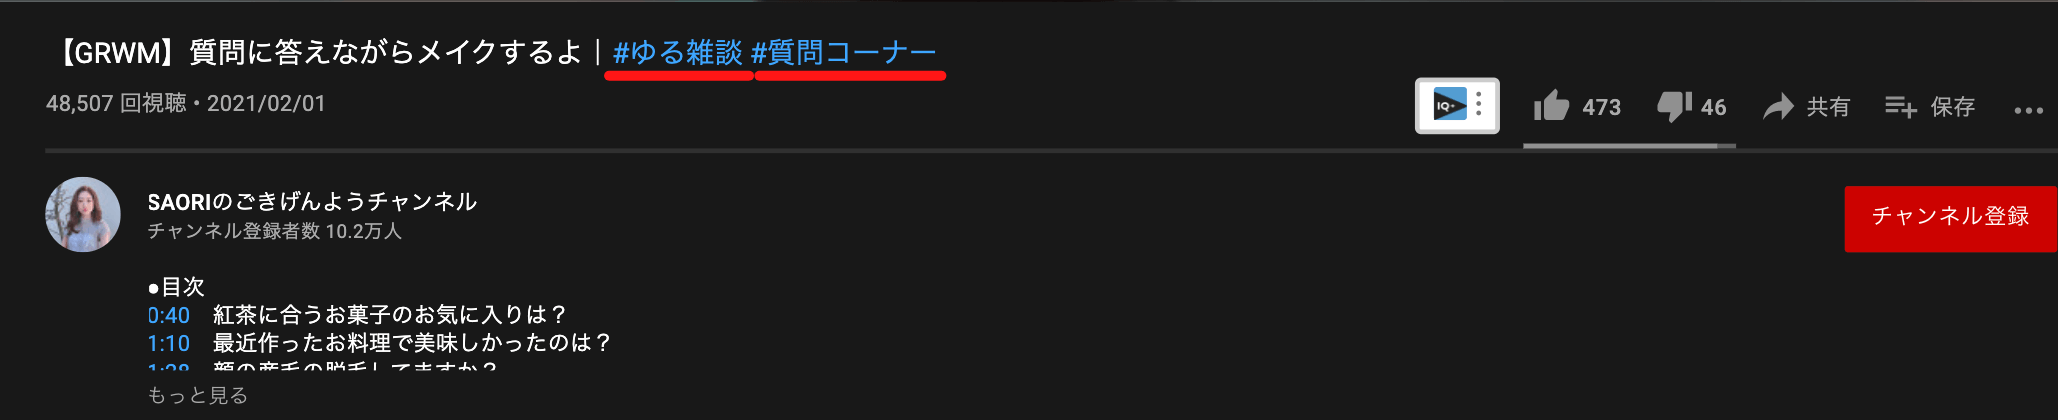 youtube-title hashtag